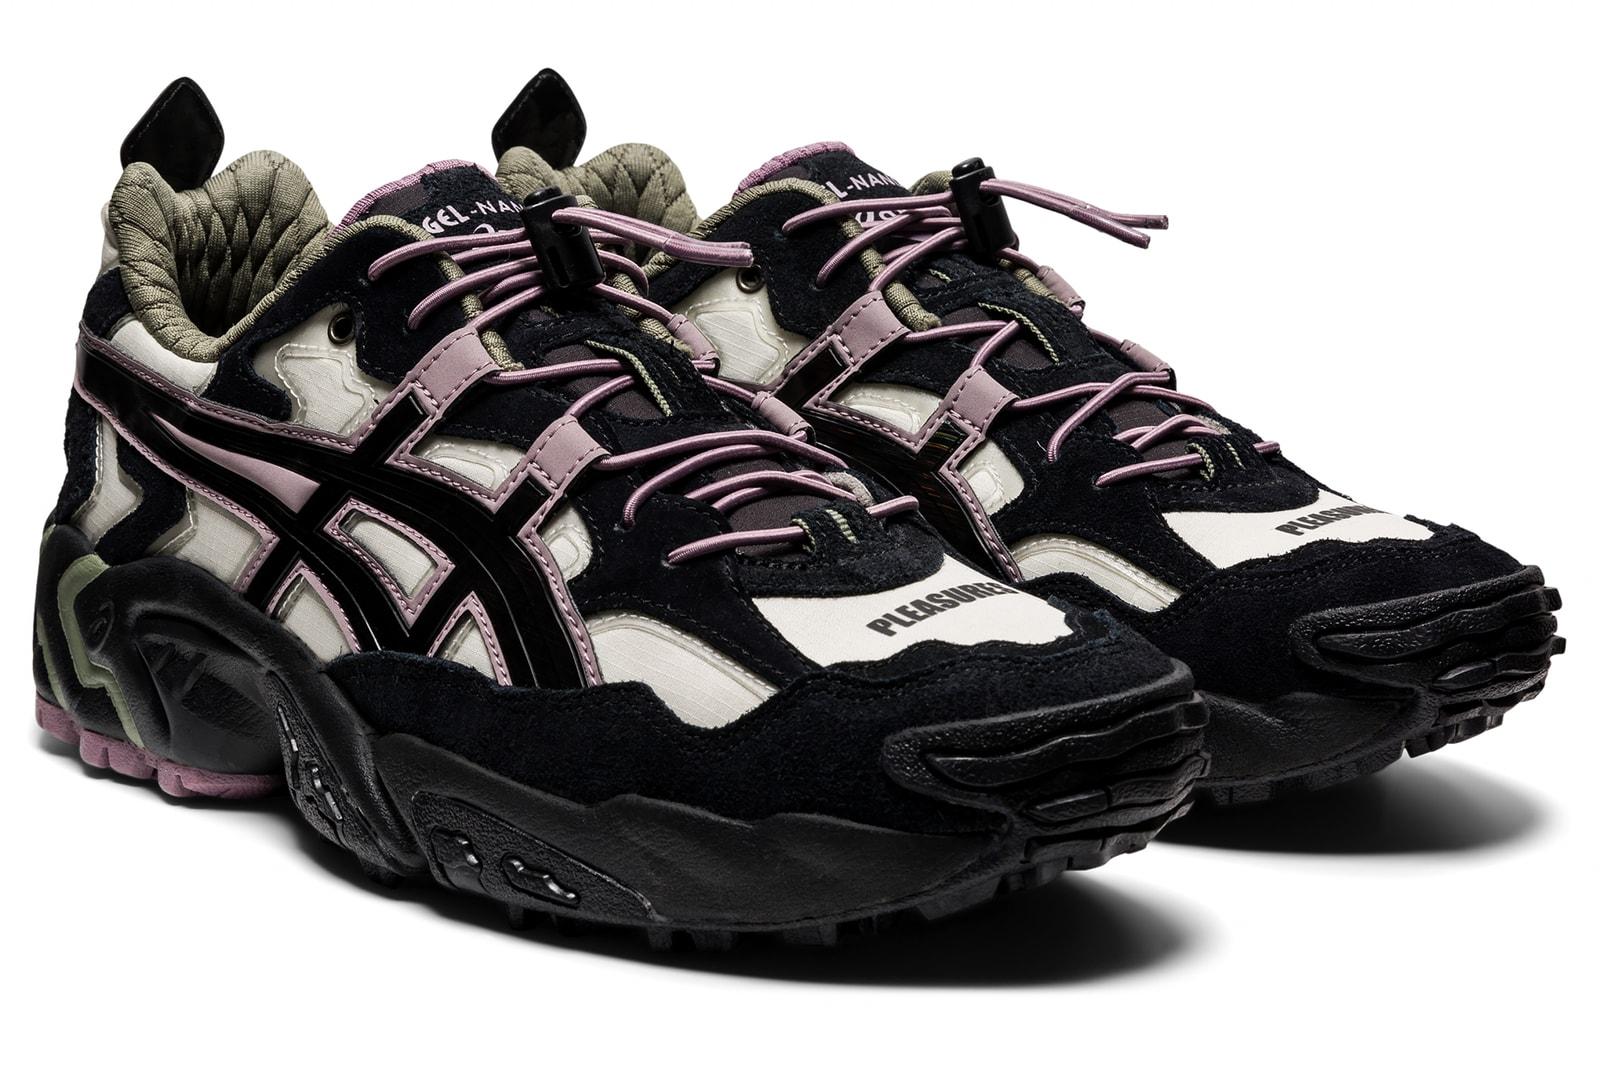 ASICS x PLEASURES GEL-NANDI OG 联名鞋款现已正式发售